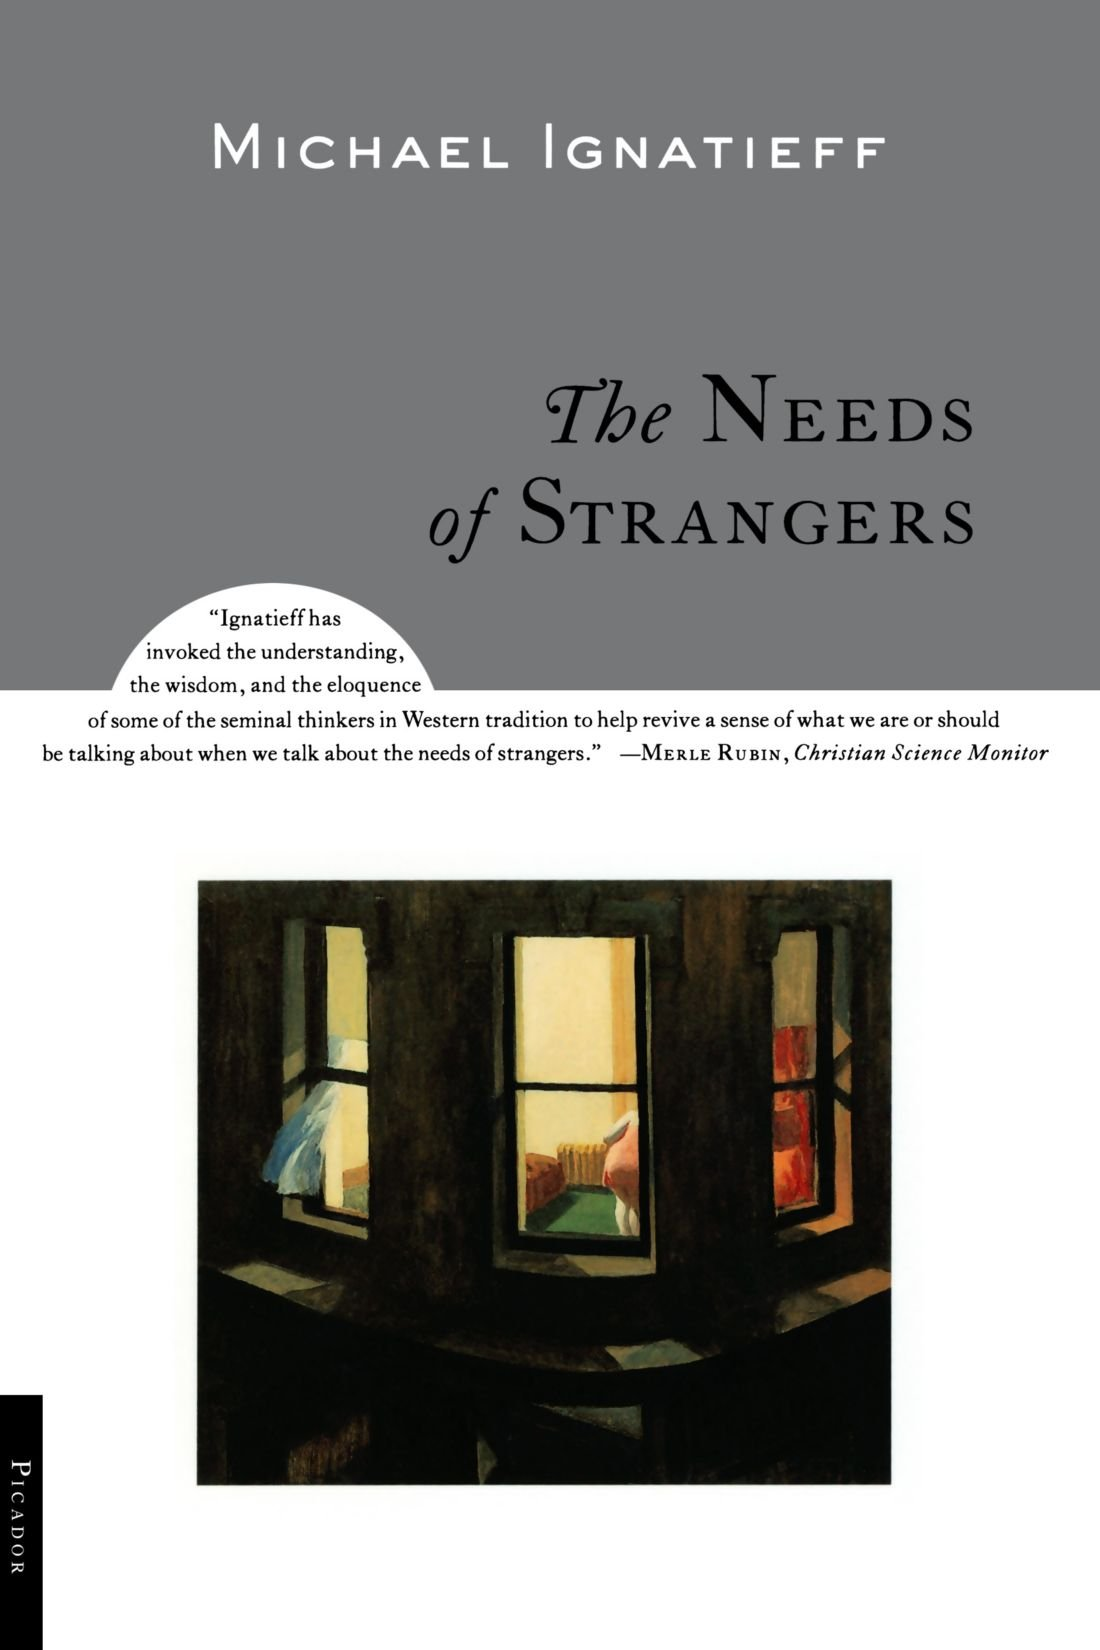 Download The Needs of Strangers ebook